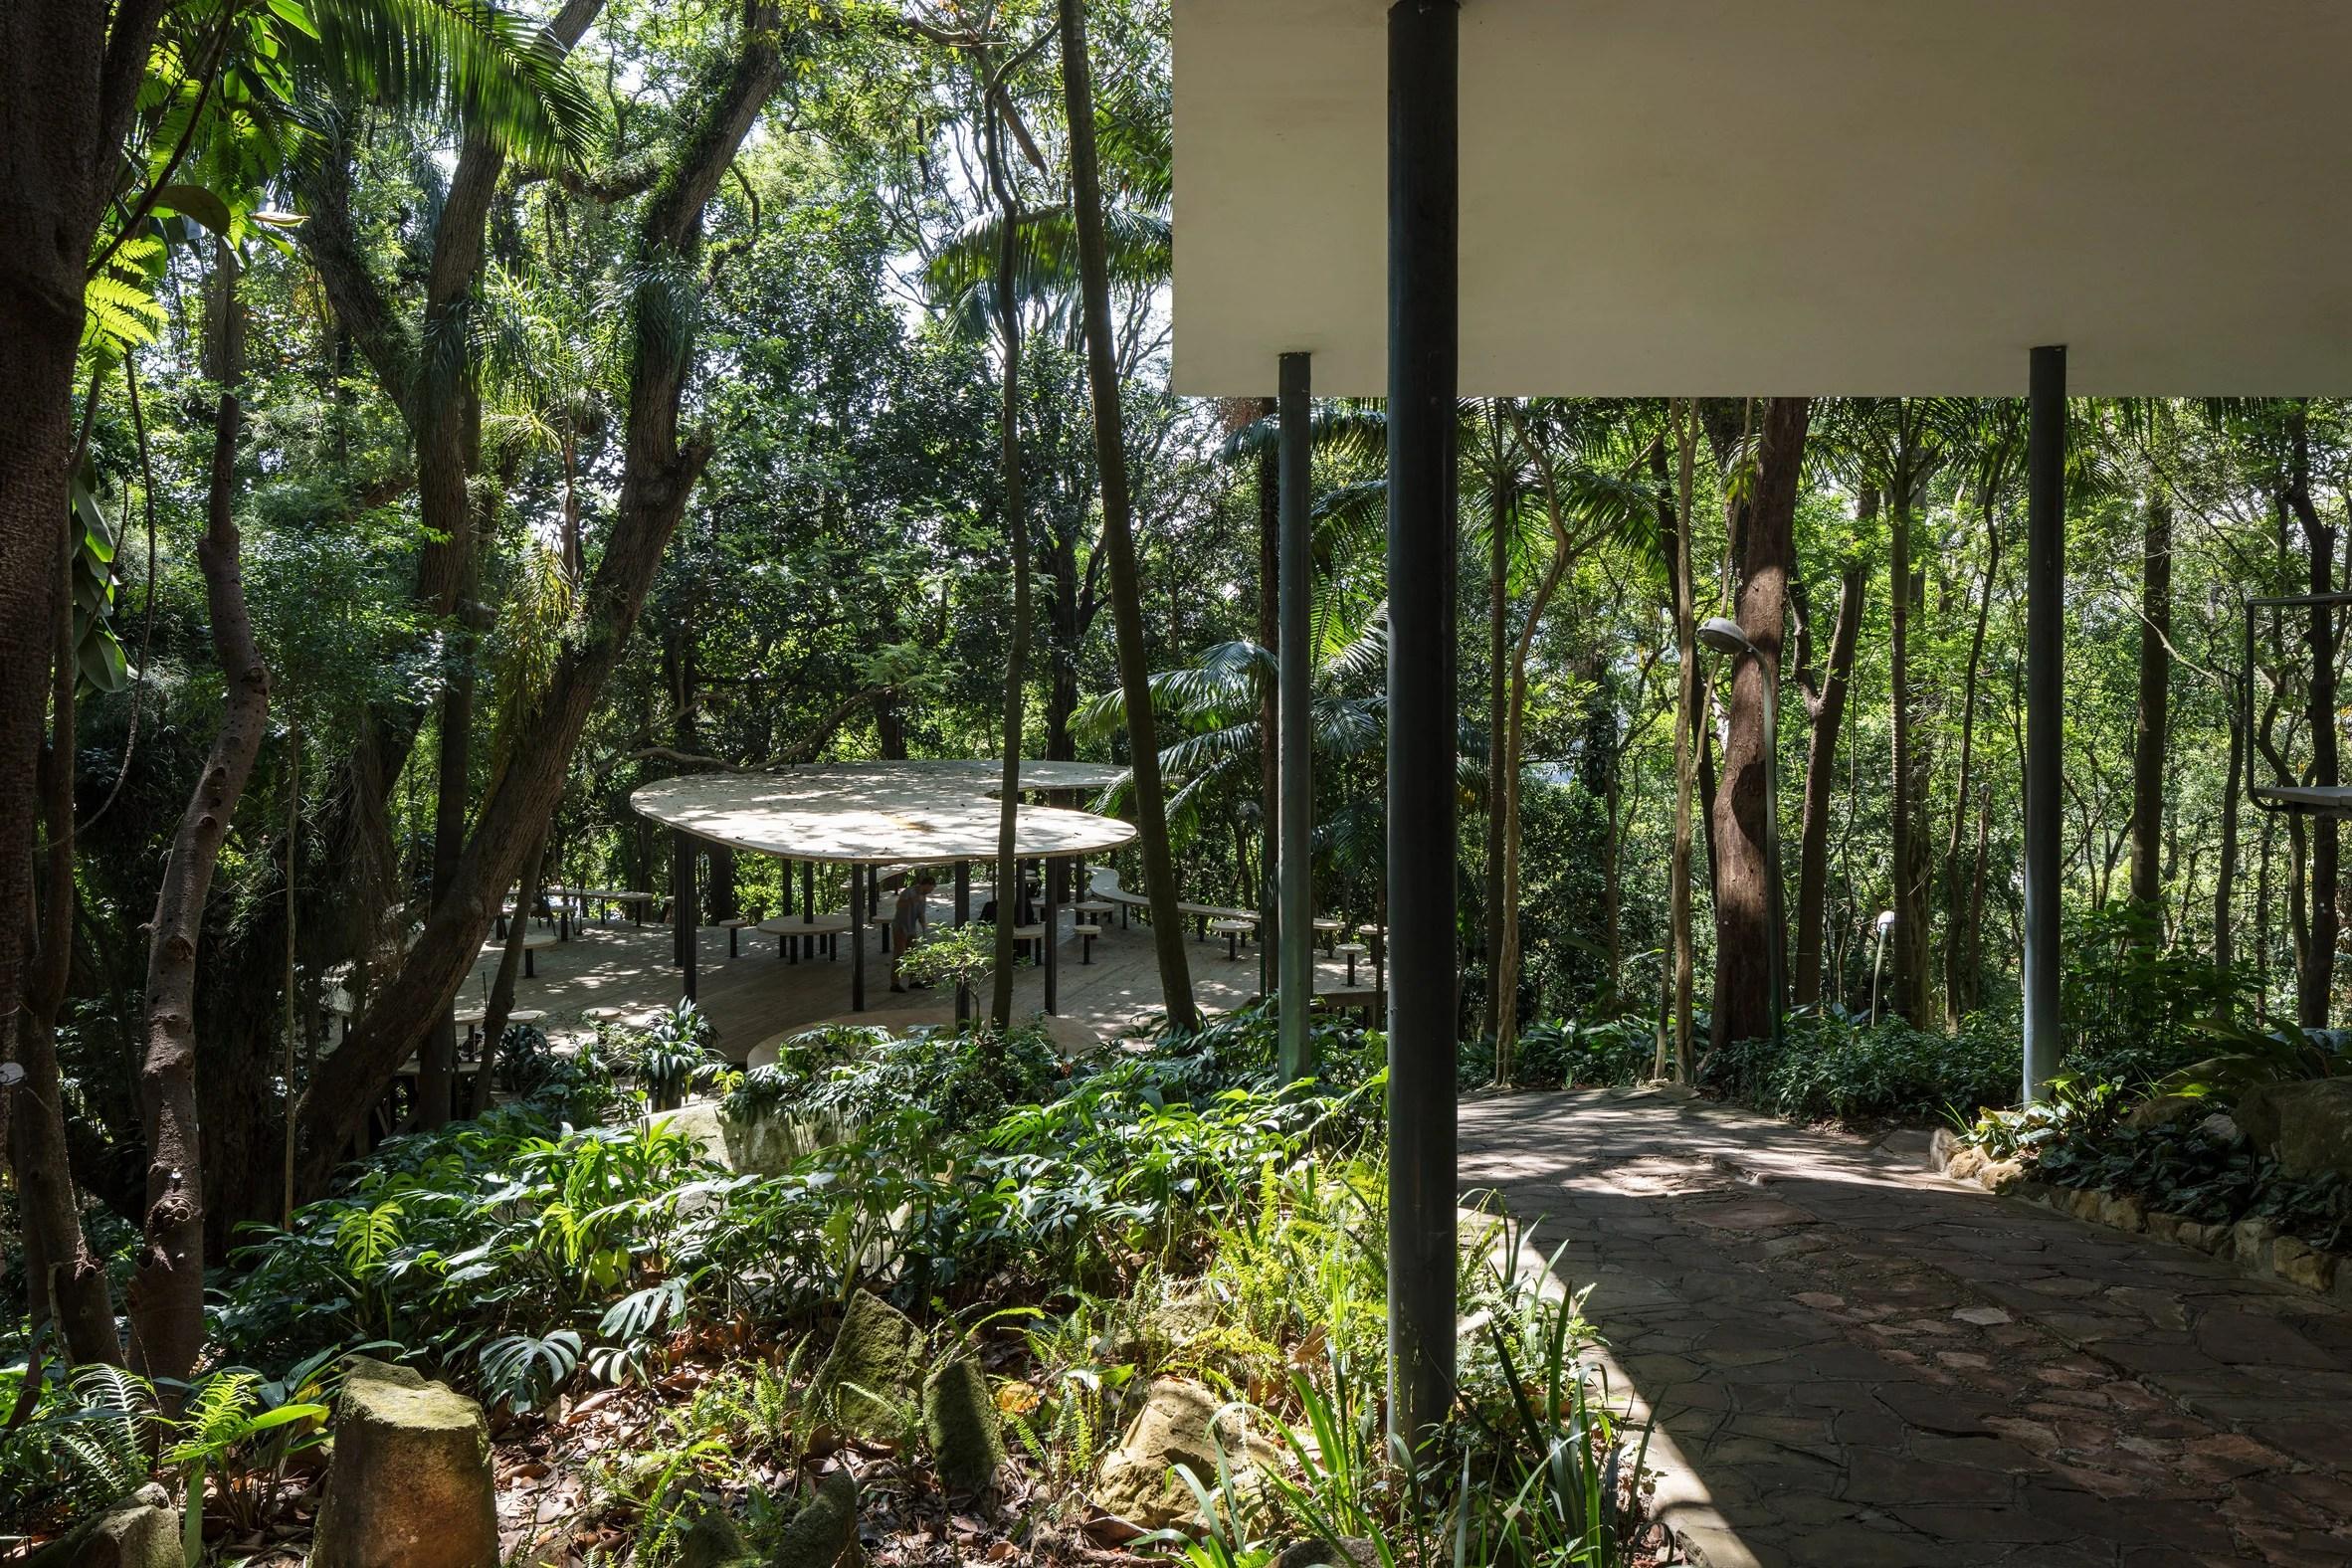 Summer House by Sol Camacho at Lina Bo Bardi's Glass House